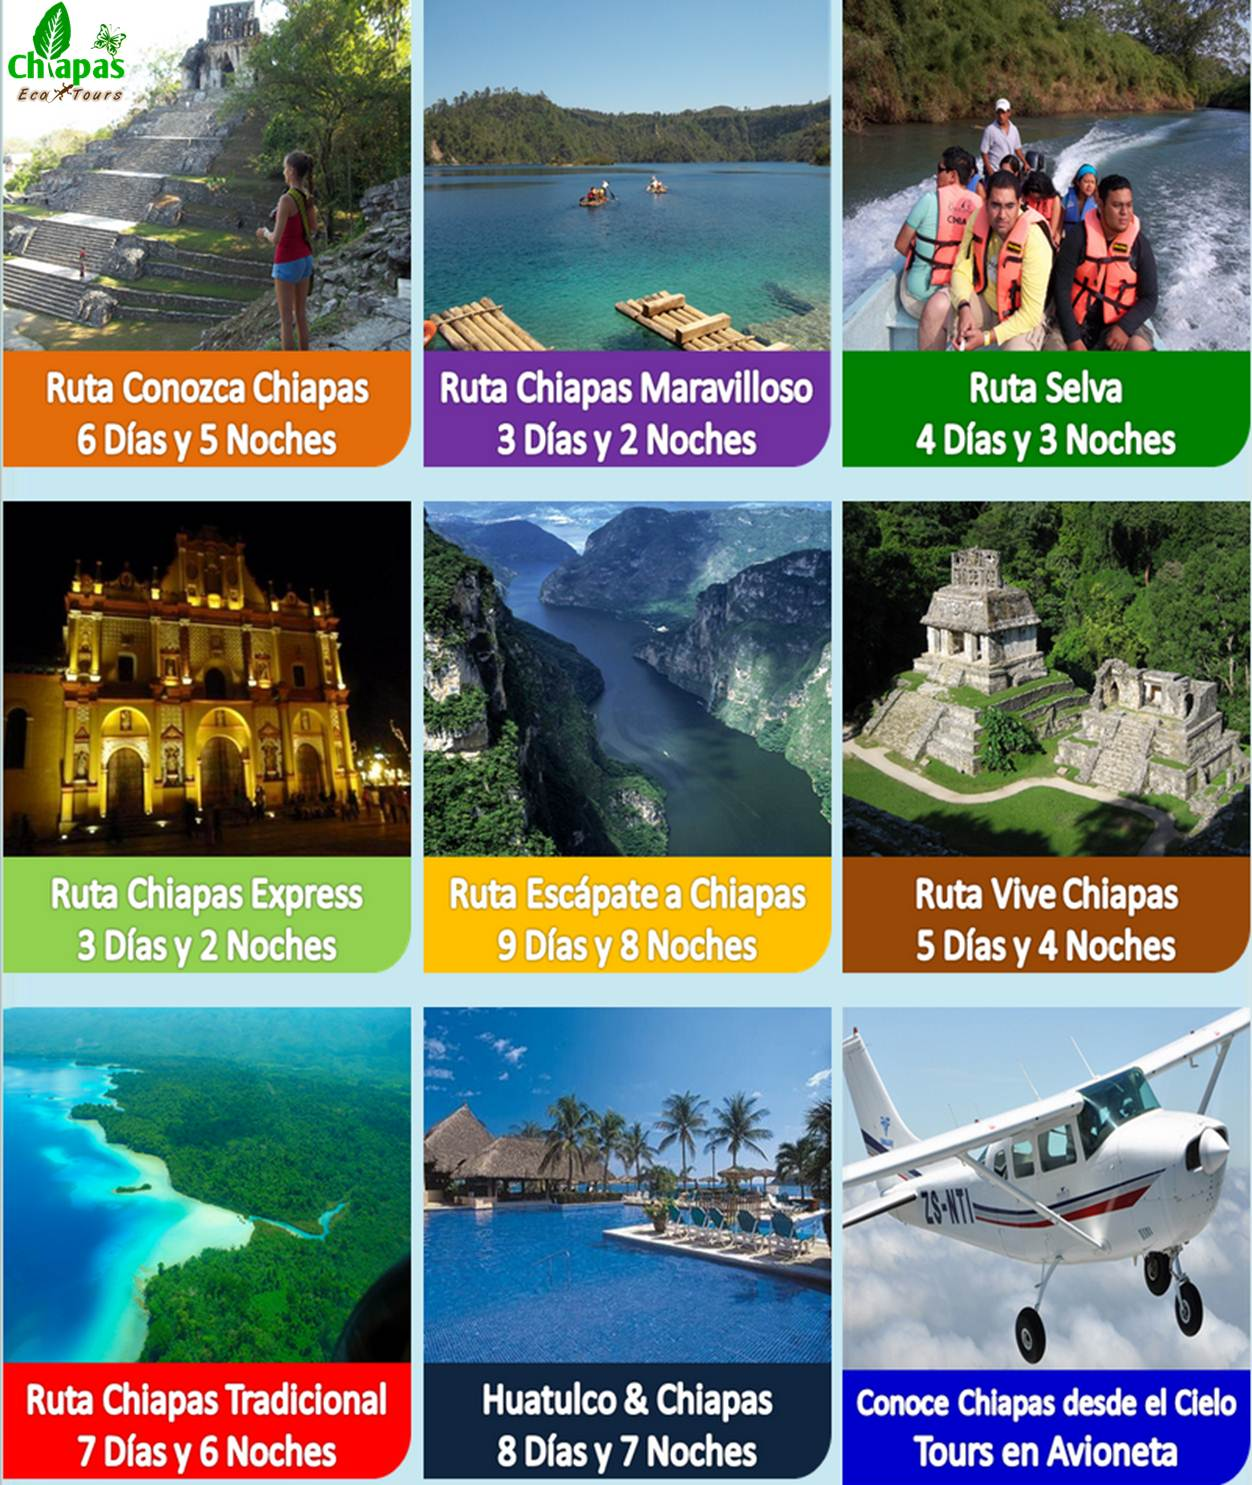 Chiapas Eco Tours Tuxtla Gutiérrez